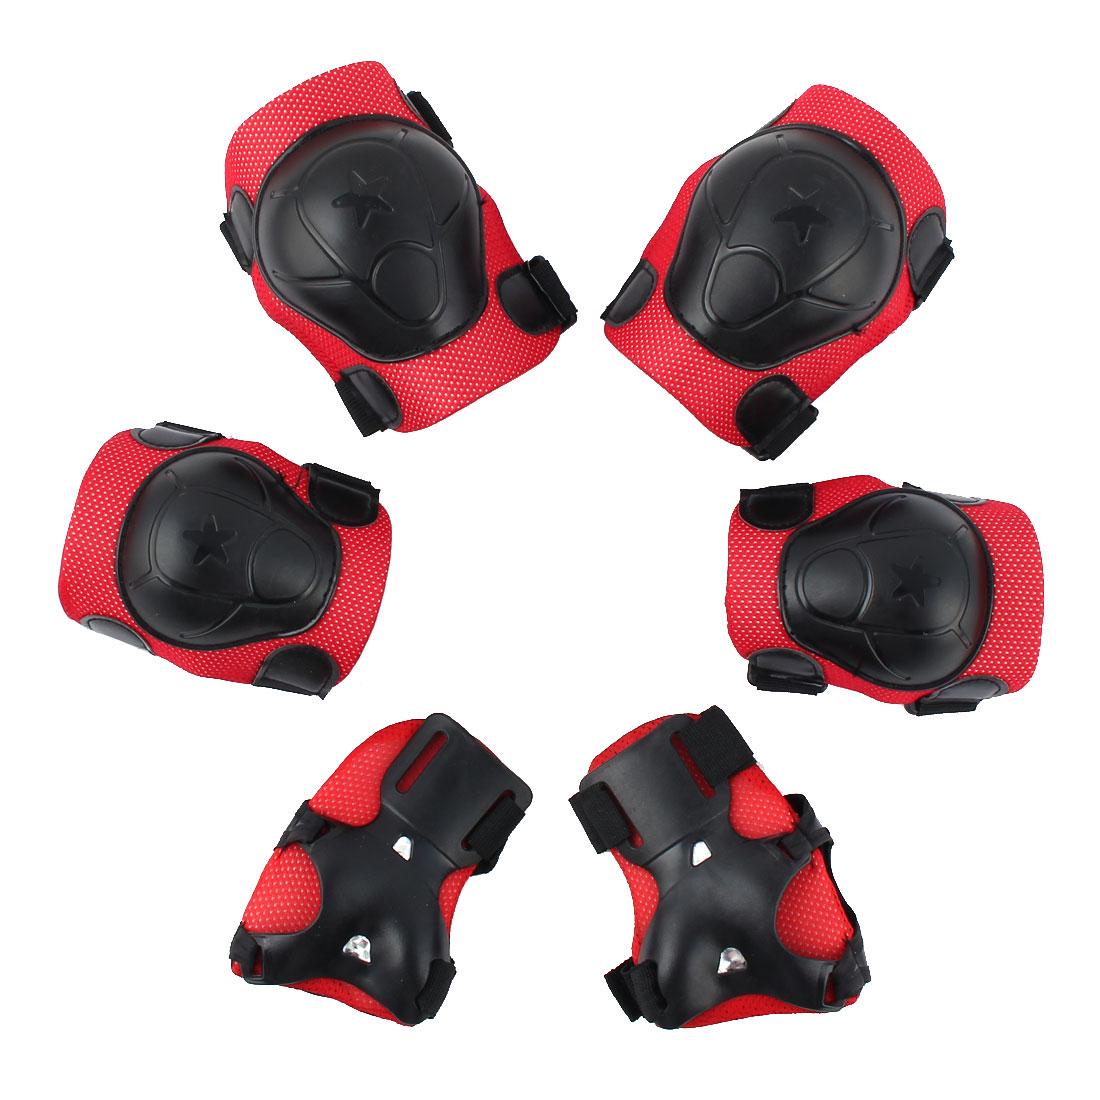 6pcs  Bicycle Roller Skating Wrist Elbow Knee Pad Protector Guard Red Black